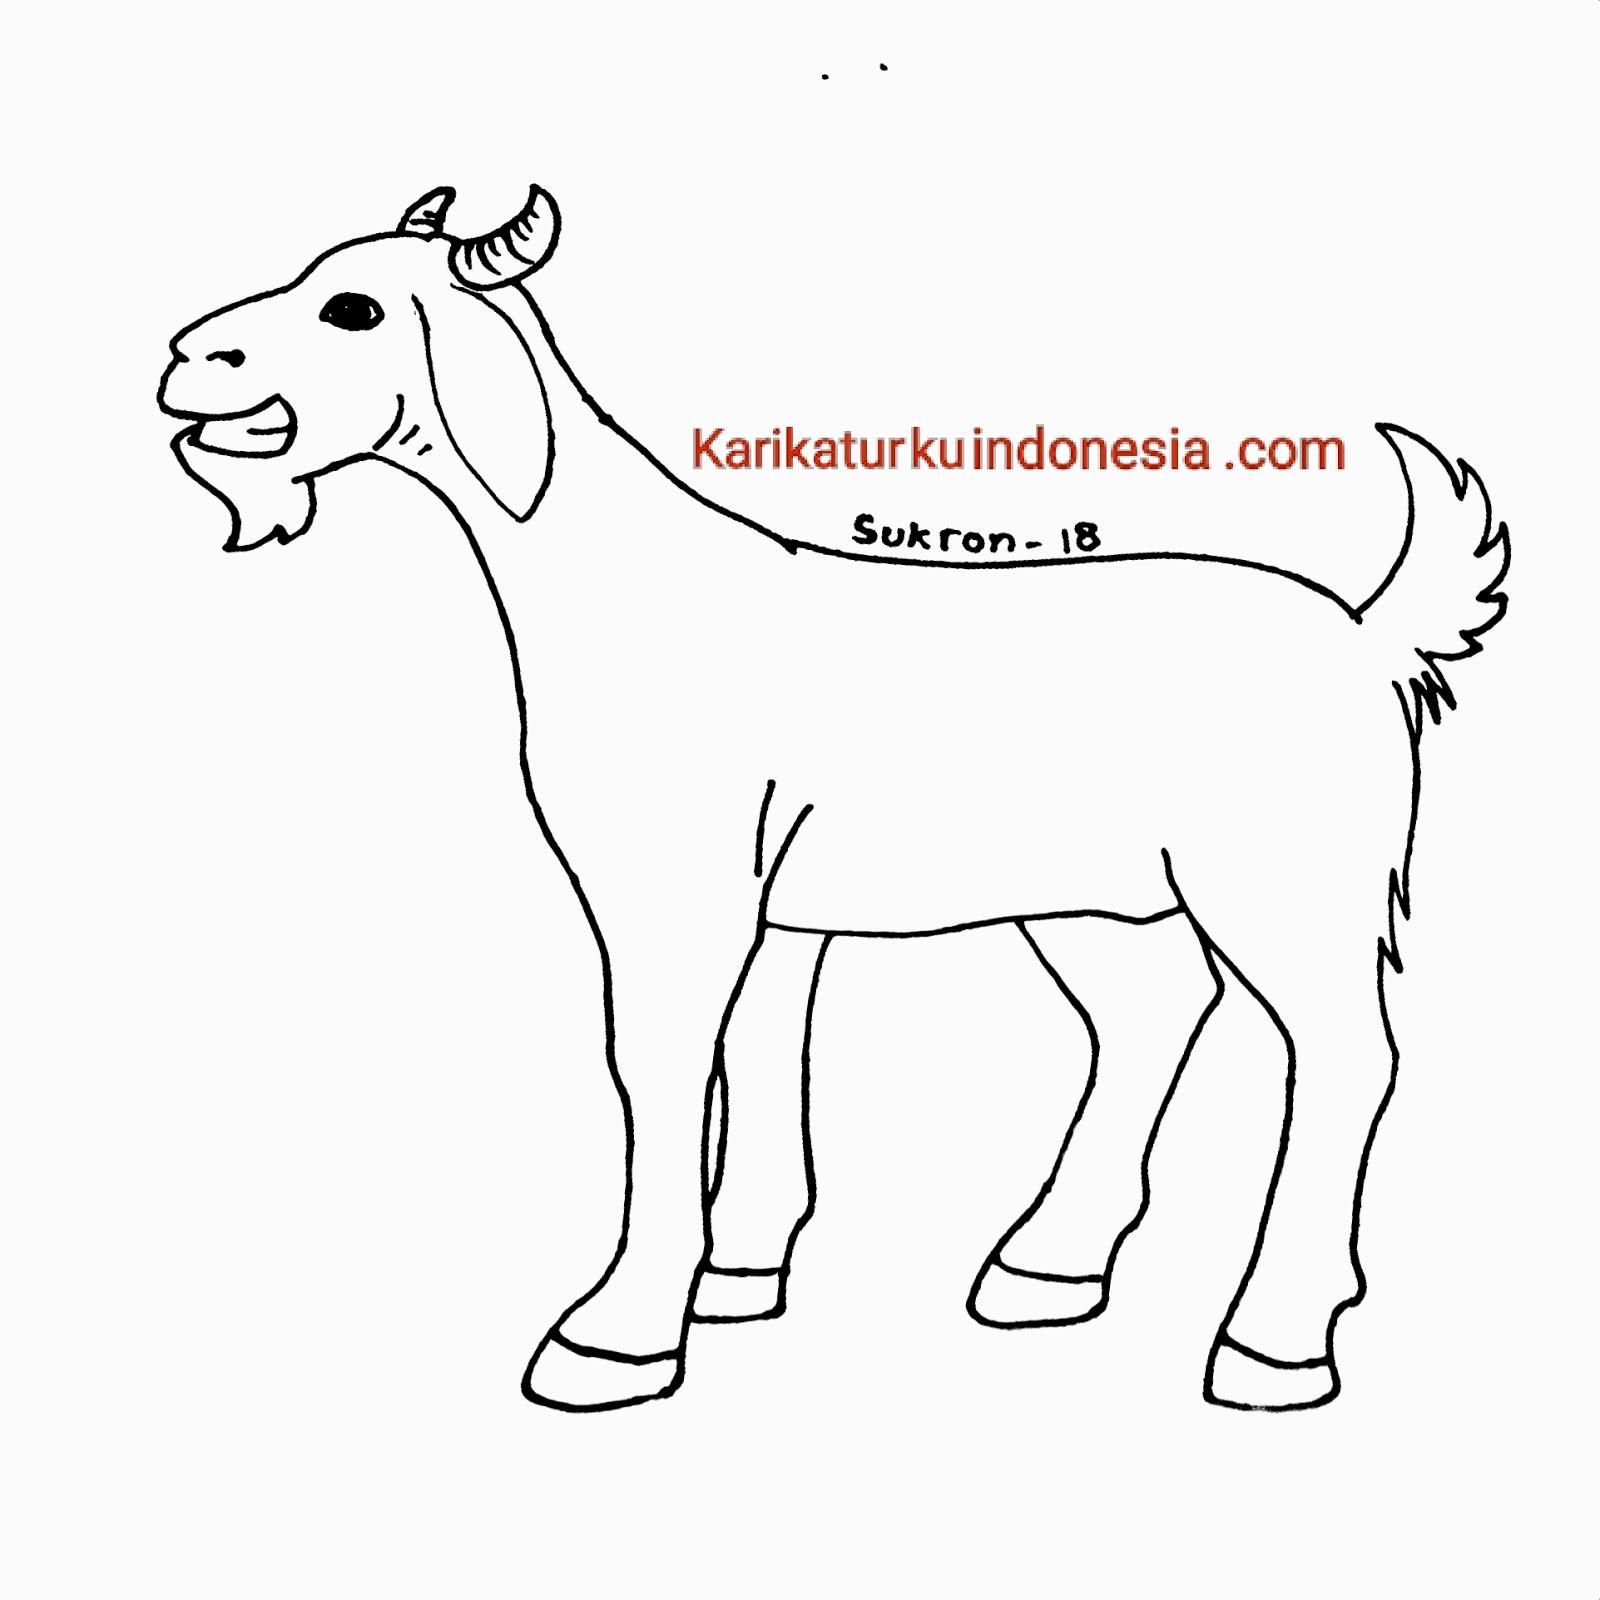 contoh gambar mewarnai binatang qurban